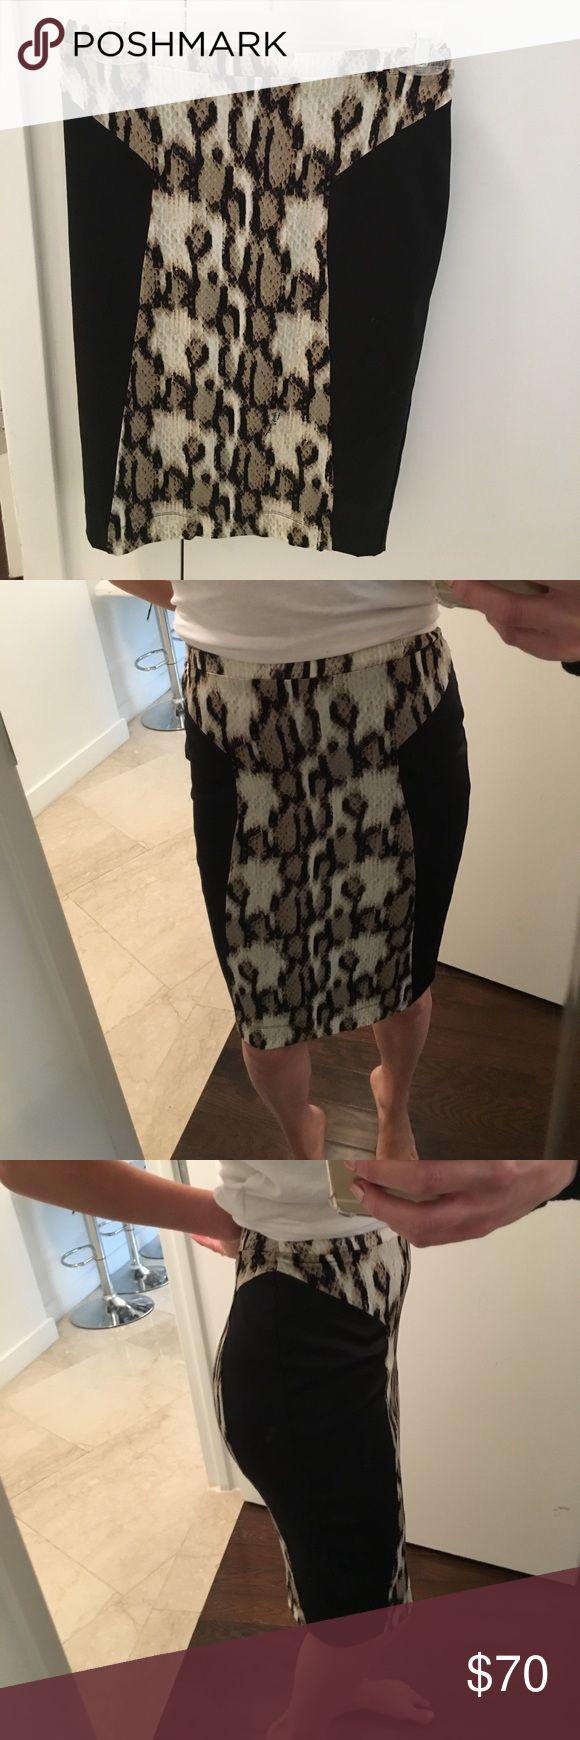 Roberto Cavalli Cheetah Skirt Roberto Cavalli Cheetah Skirt. Great condition. Size 38 = size 2 U.S.  so comfortable and hot ! Roberto Cavalli Skirts